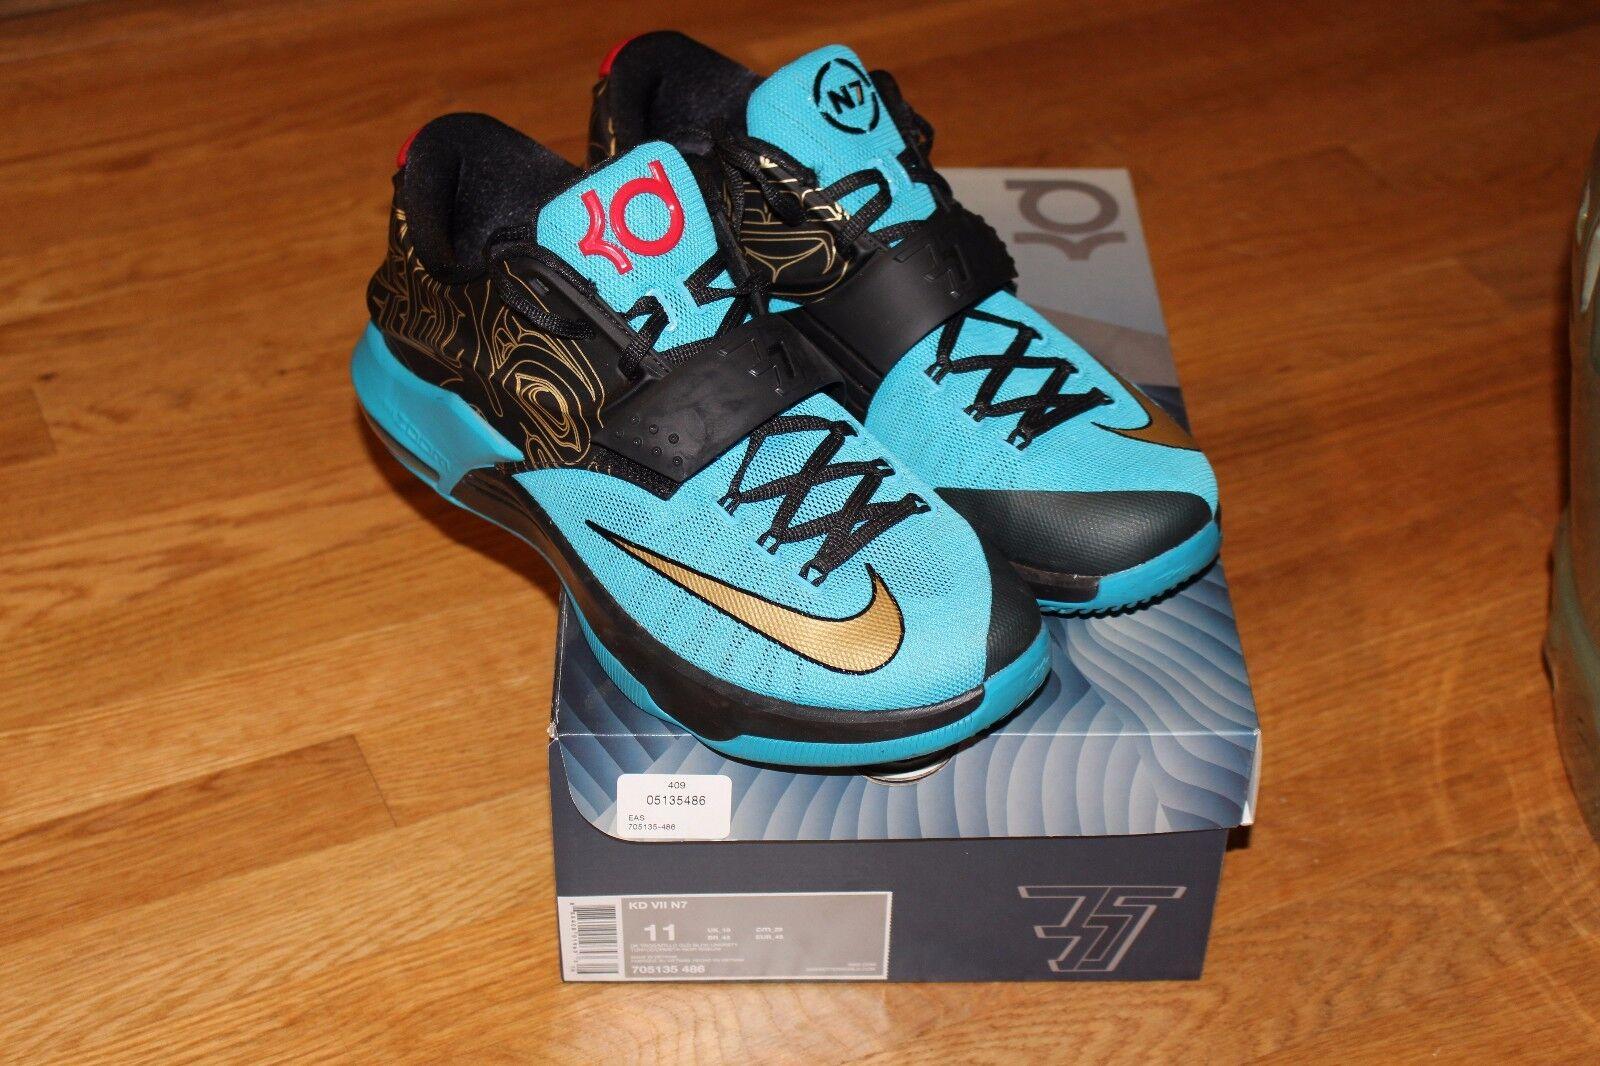 Nike kd 7 n7 vnds vnds vnds größe 11 mit original - box cecdd9